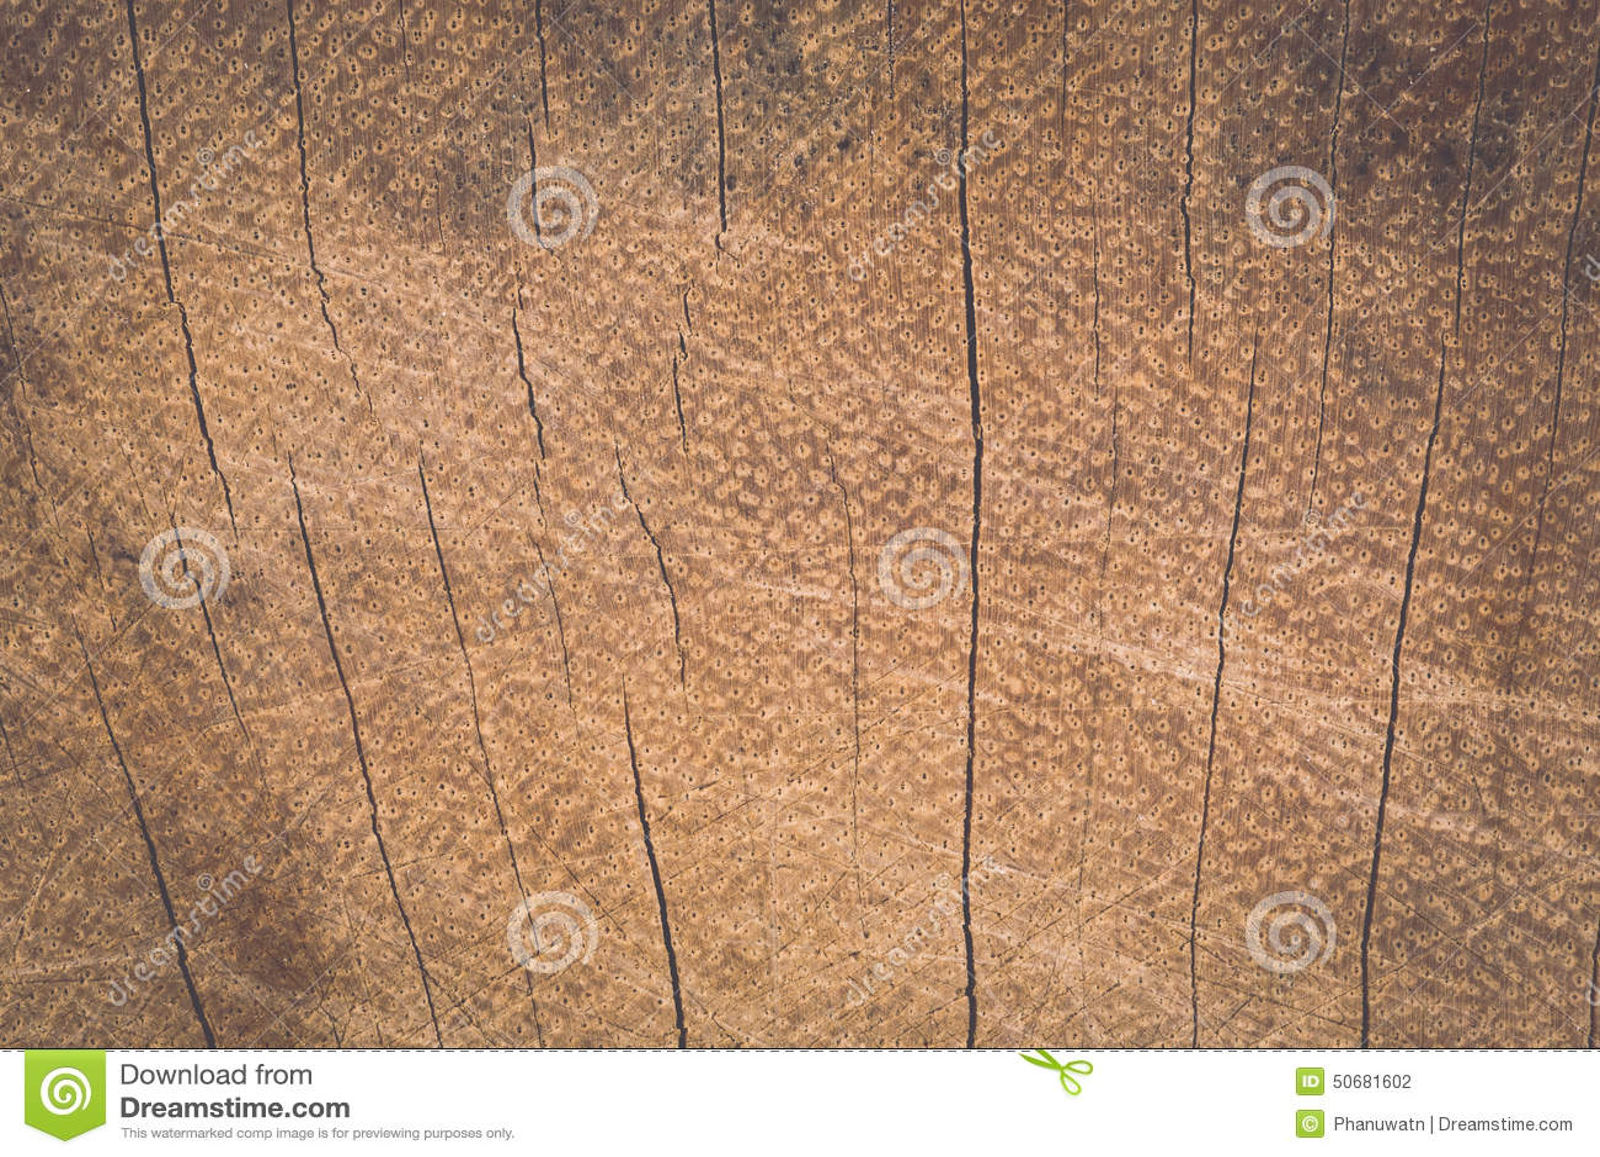 Download 树桩纹理 库存照片. 图片 包括有 停止, 板条, 模式, 抽象, 木料, 背包, 镶边, 环形, 部分 - 50681602